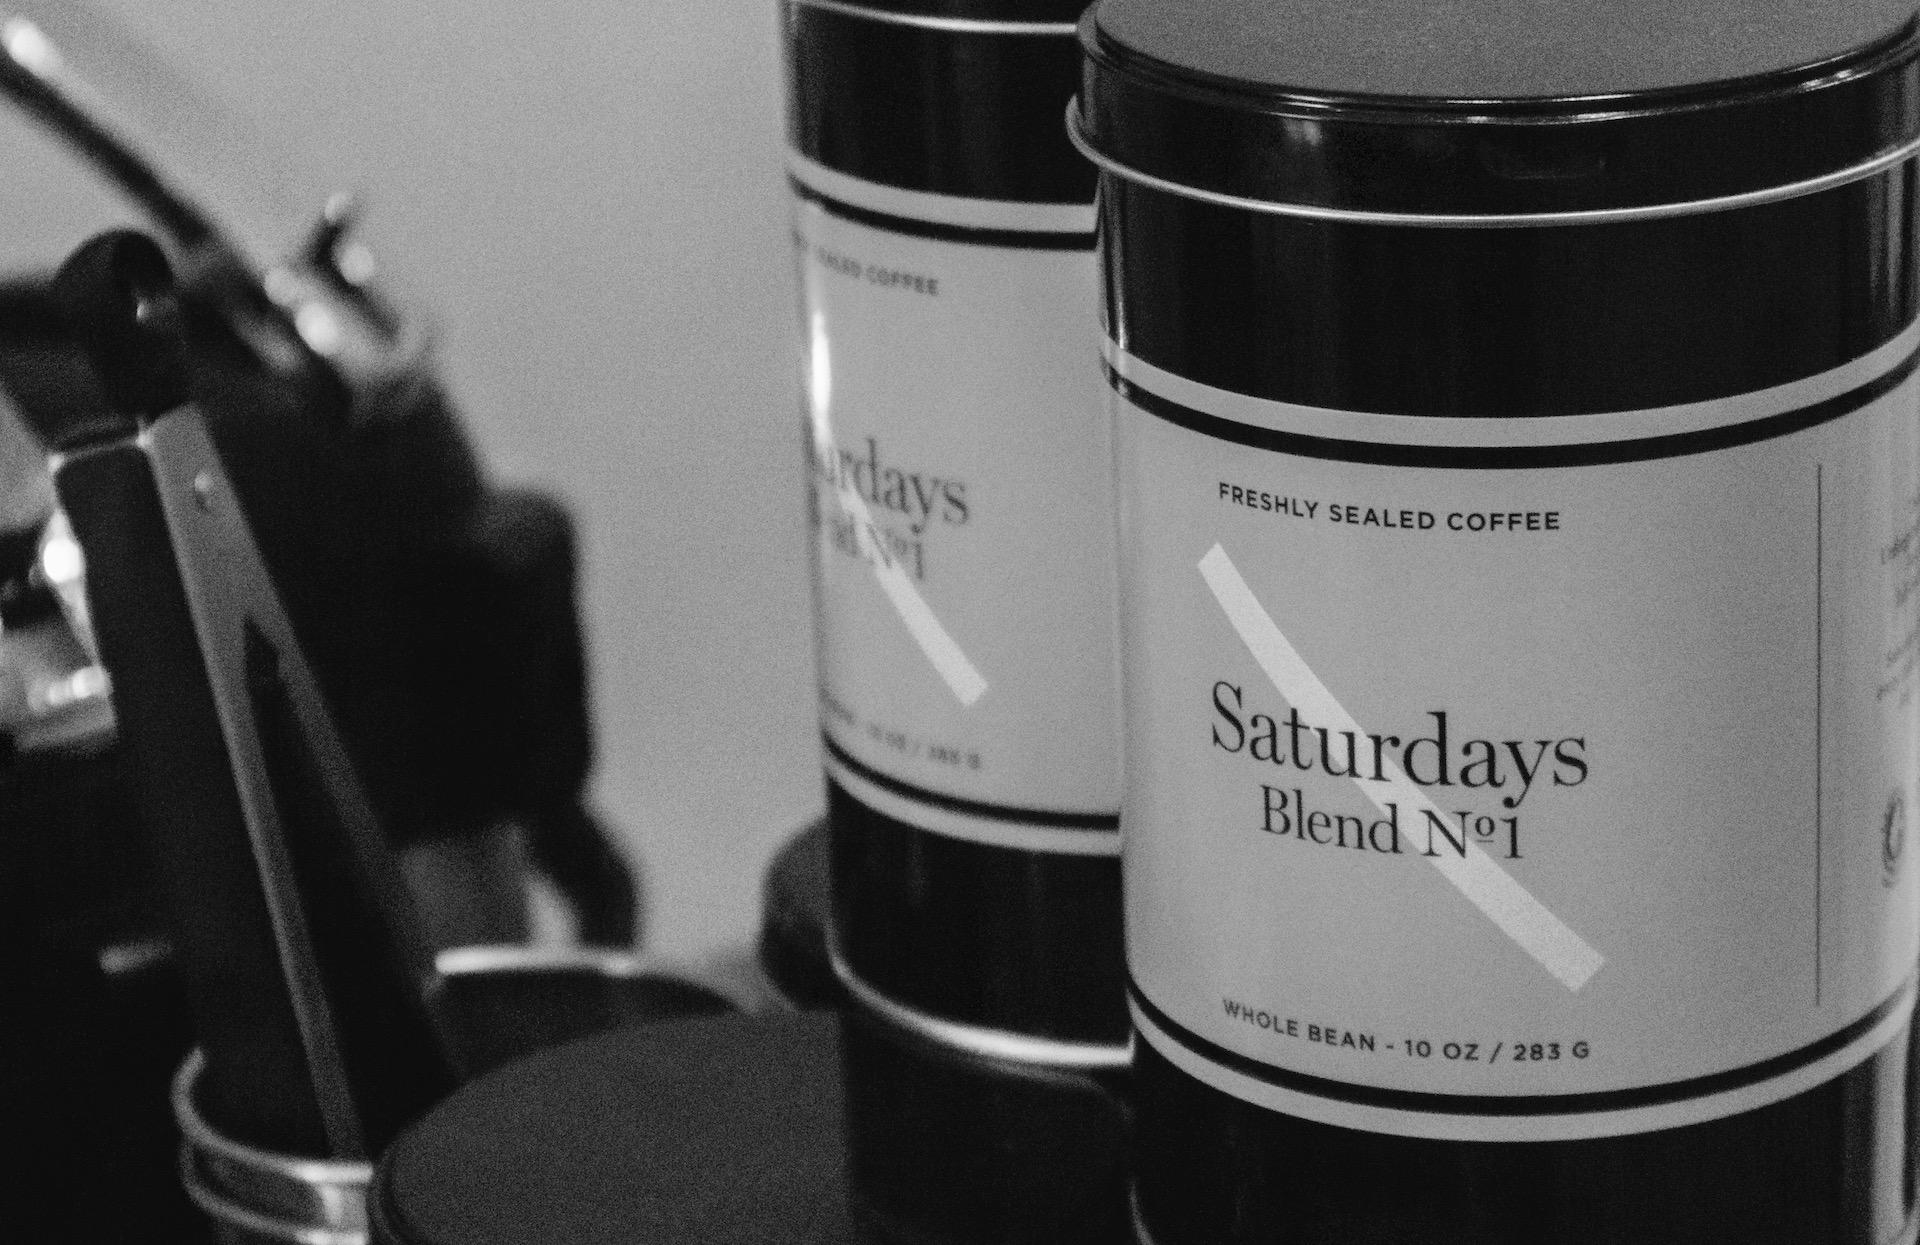 Saturdays NYC coffee blend